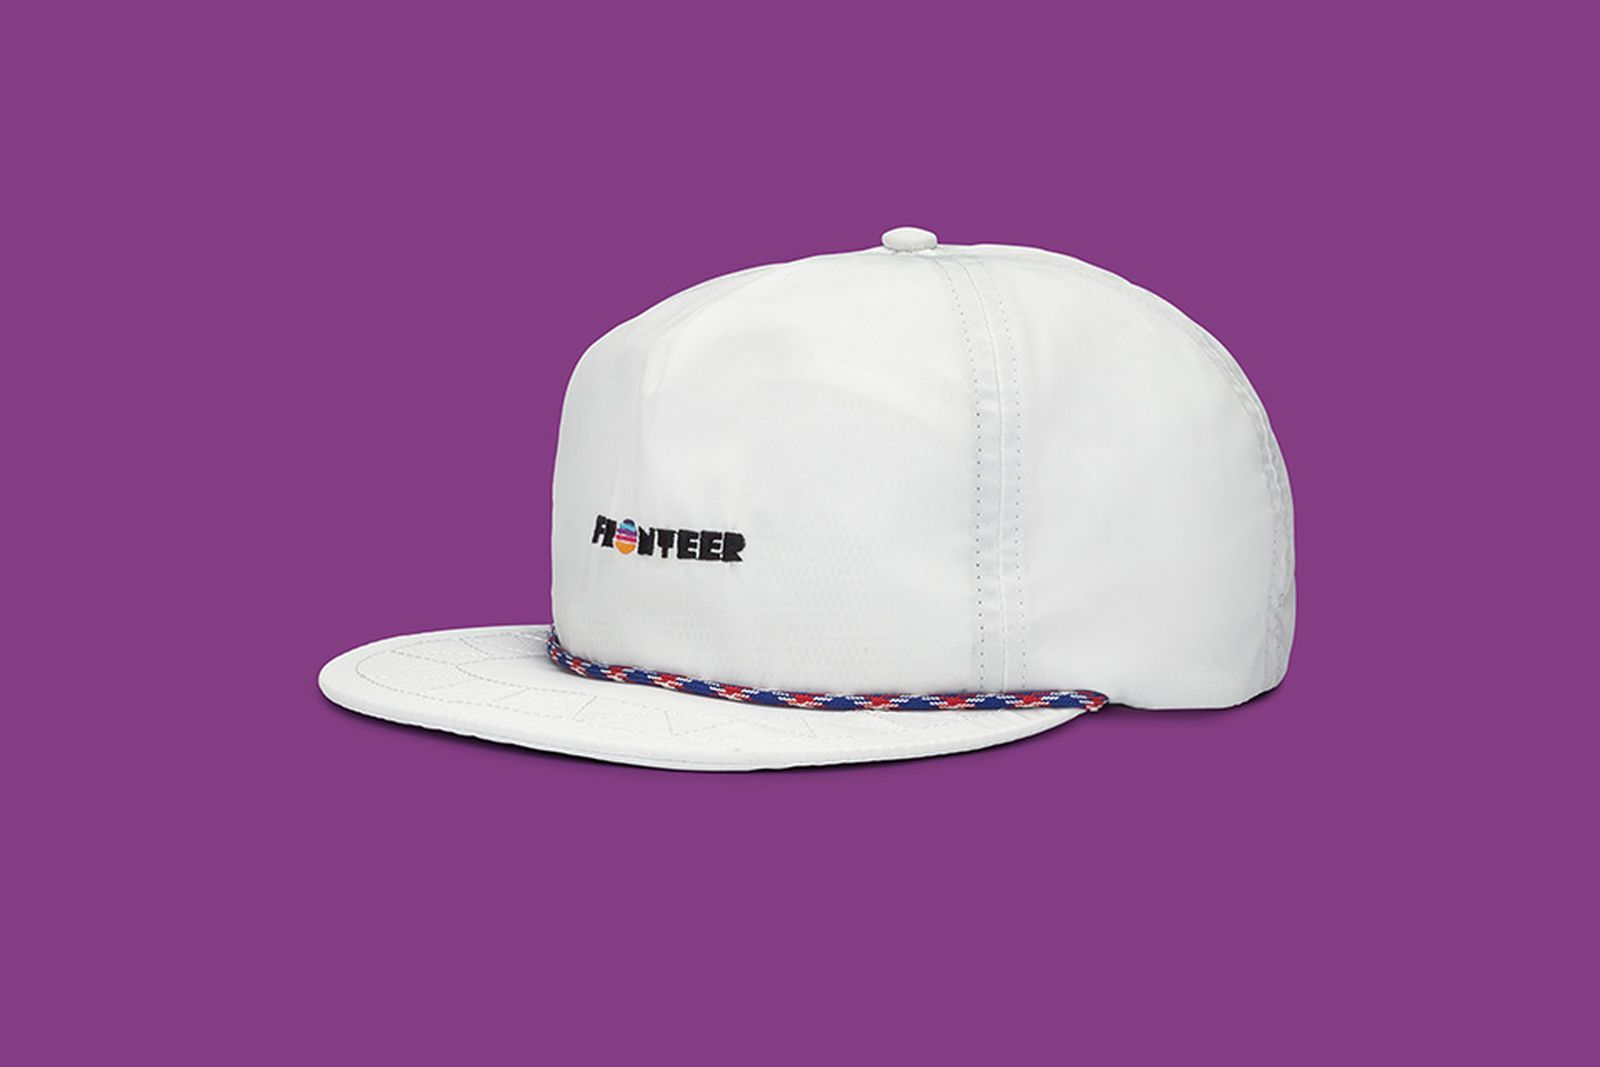 fronteer-ranger-boonie-12